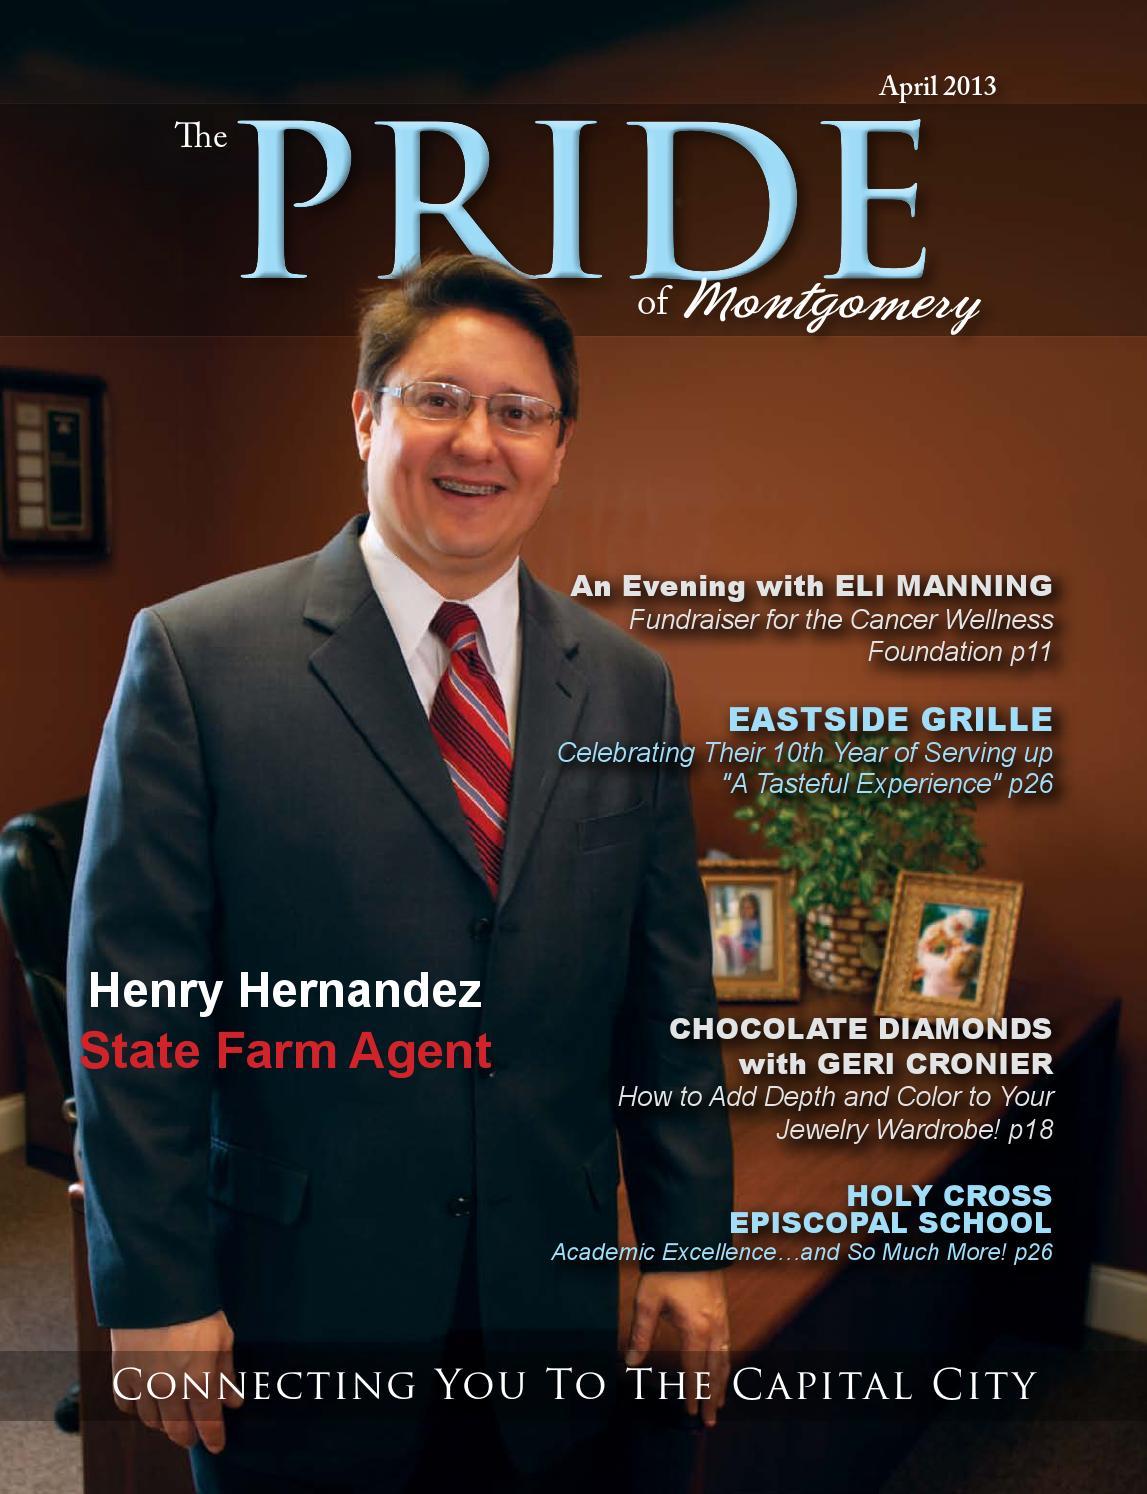 John hernandez state farm agent - John Hernandez State Farm Agent 6